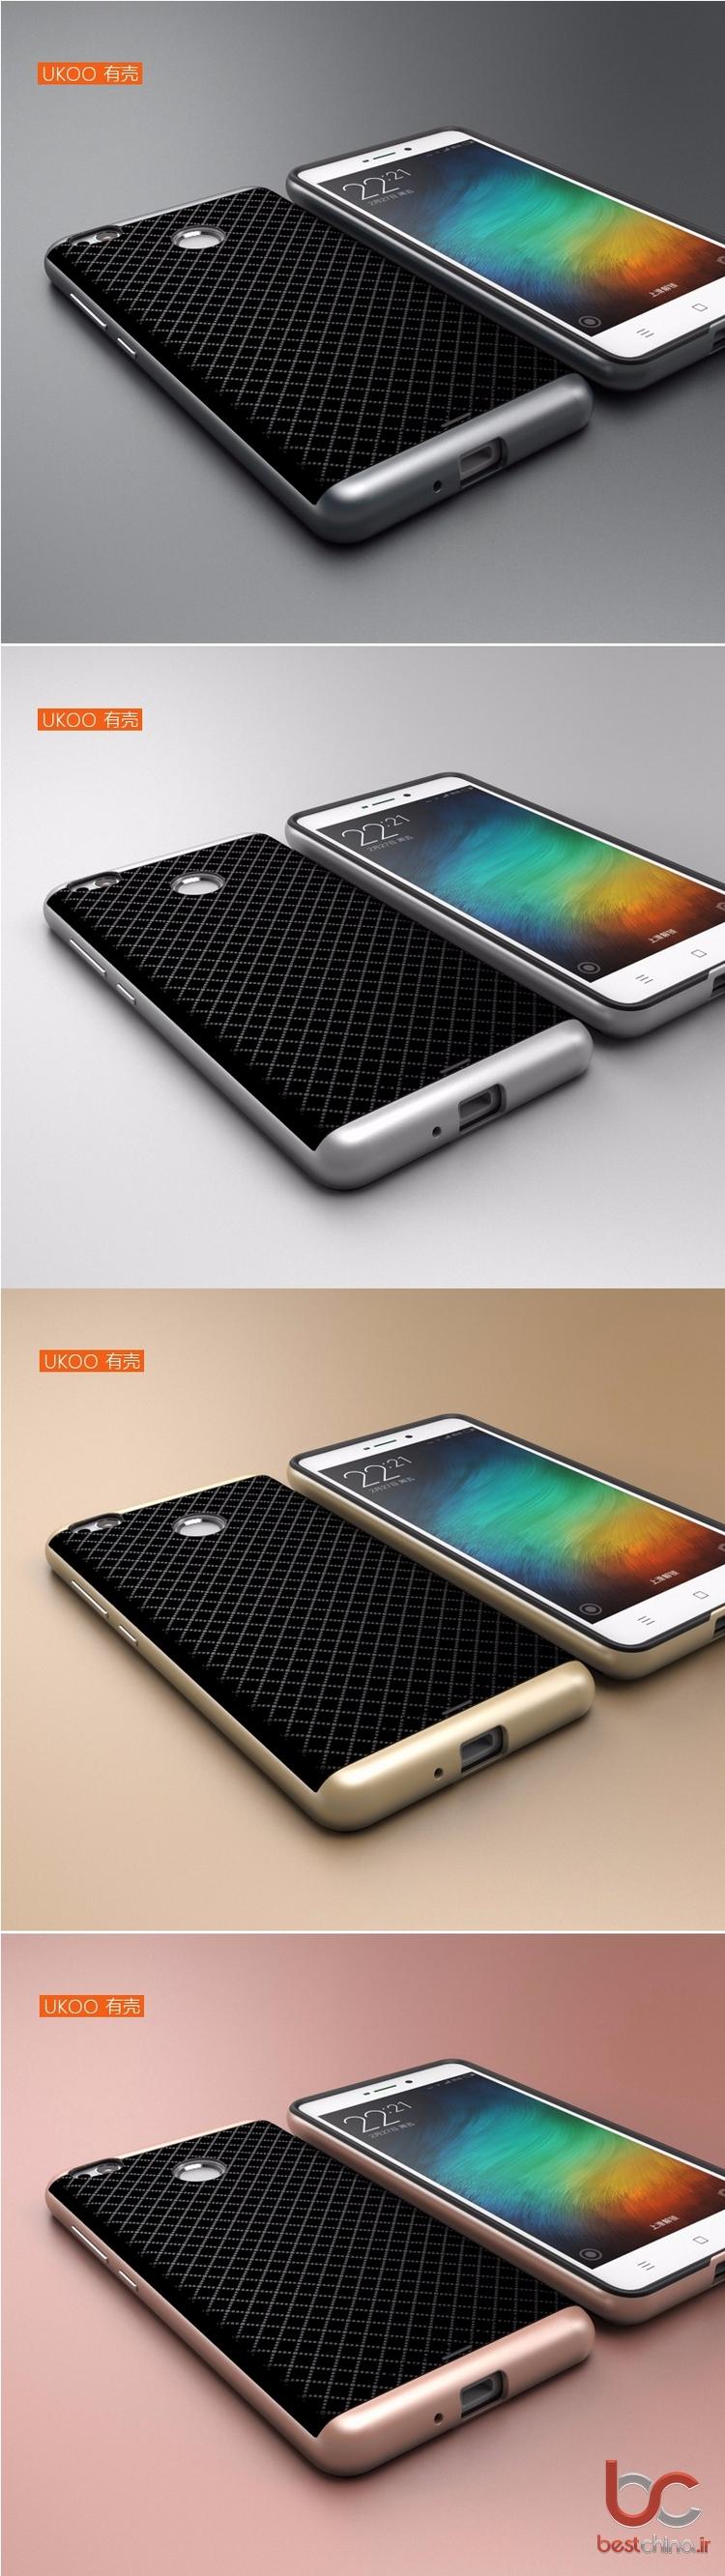 Xiaomi Redmi 3S iPaky Back Cover (2)